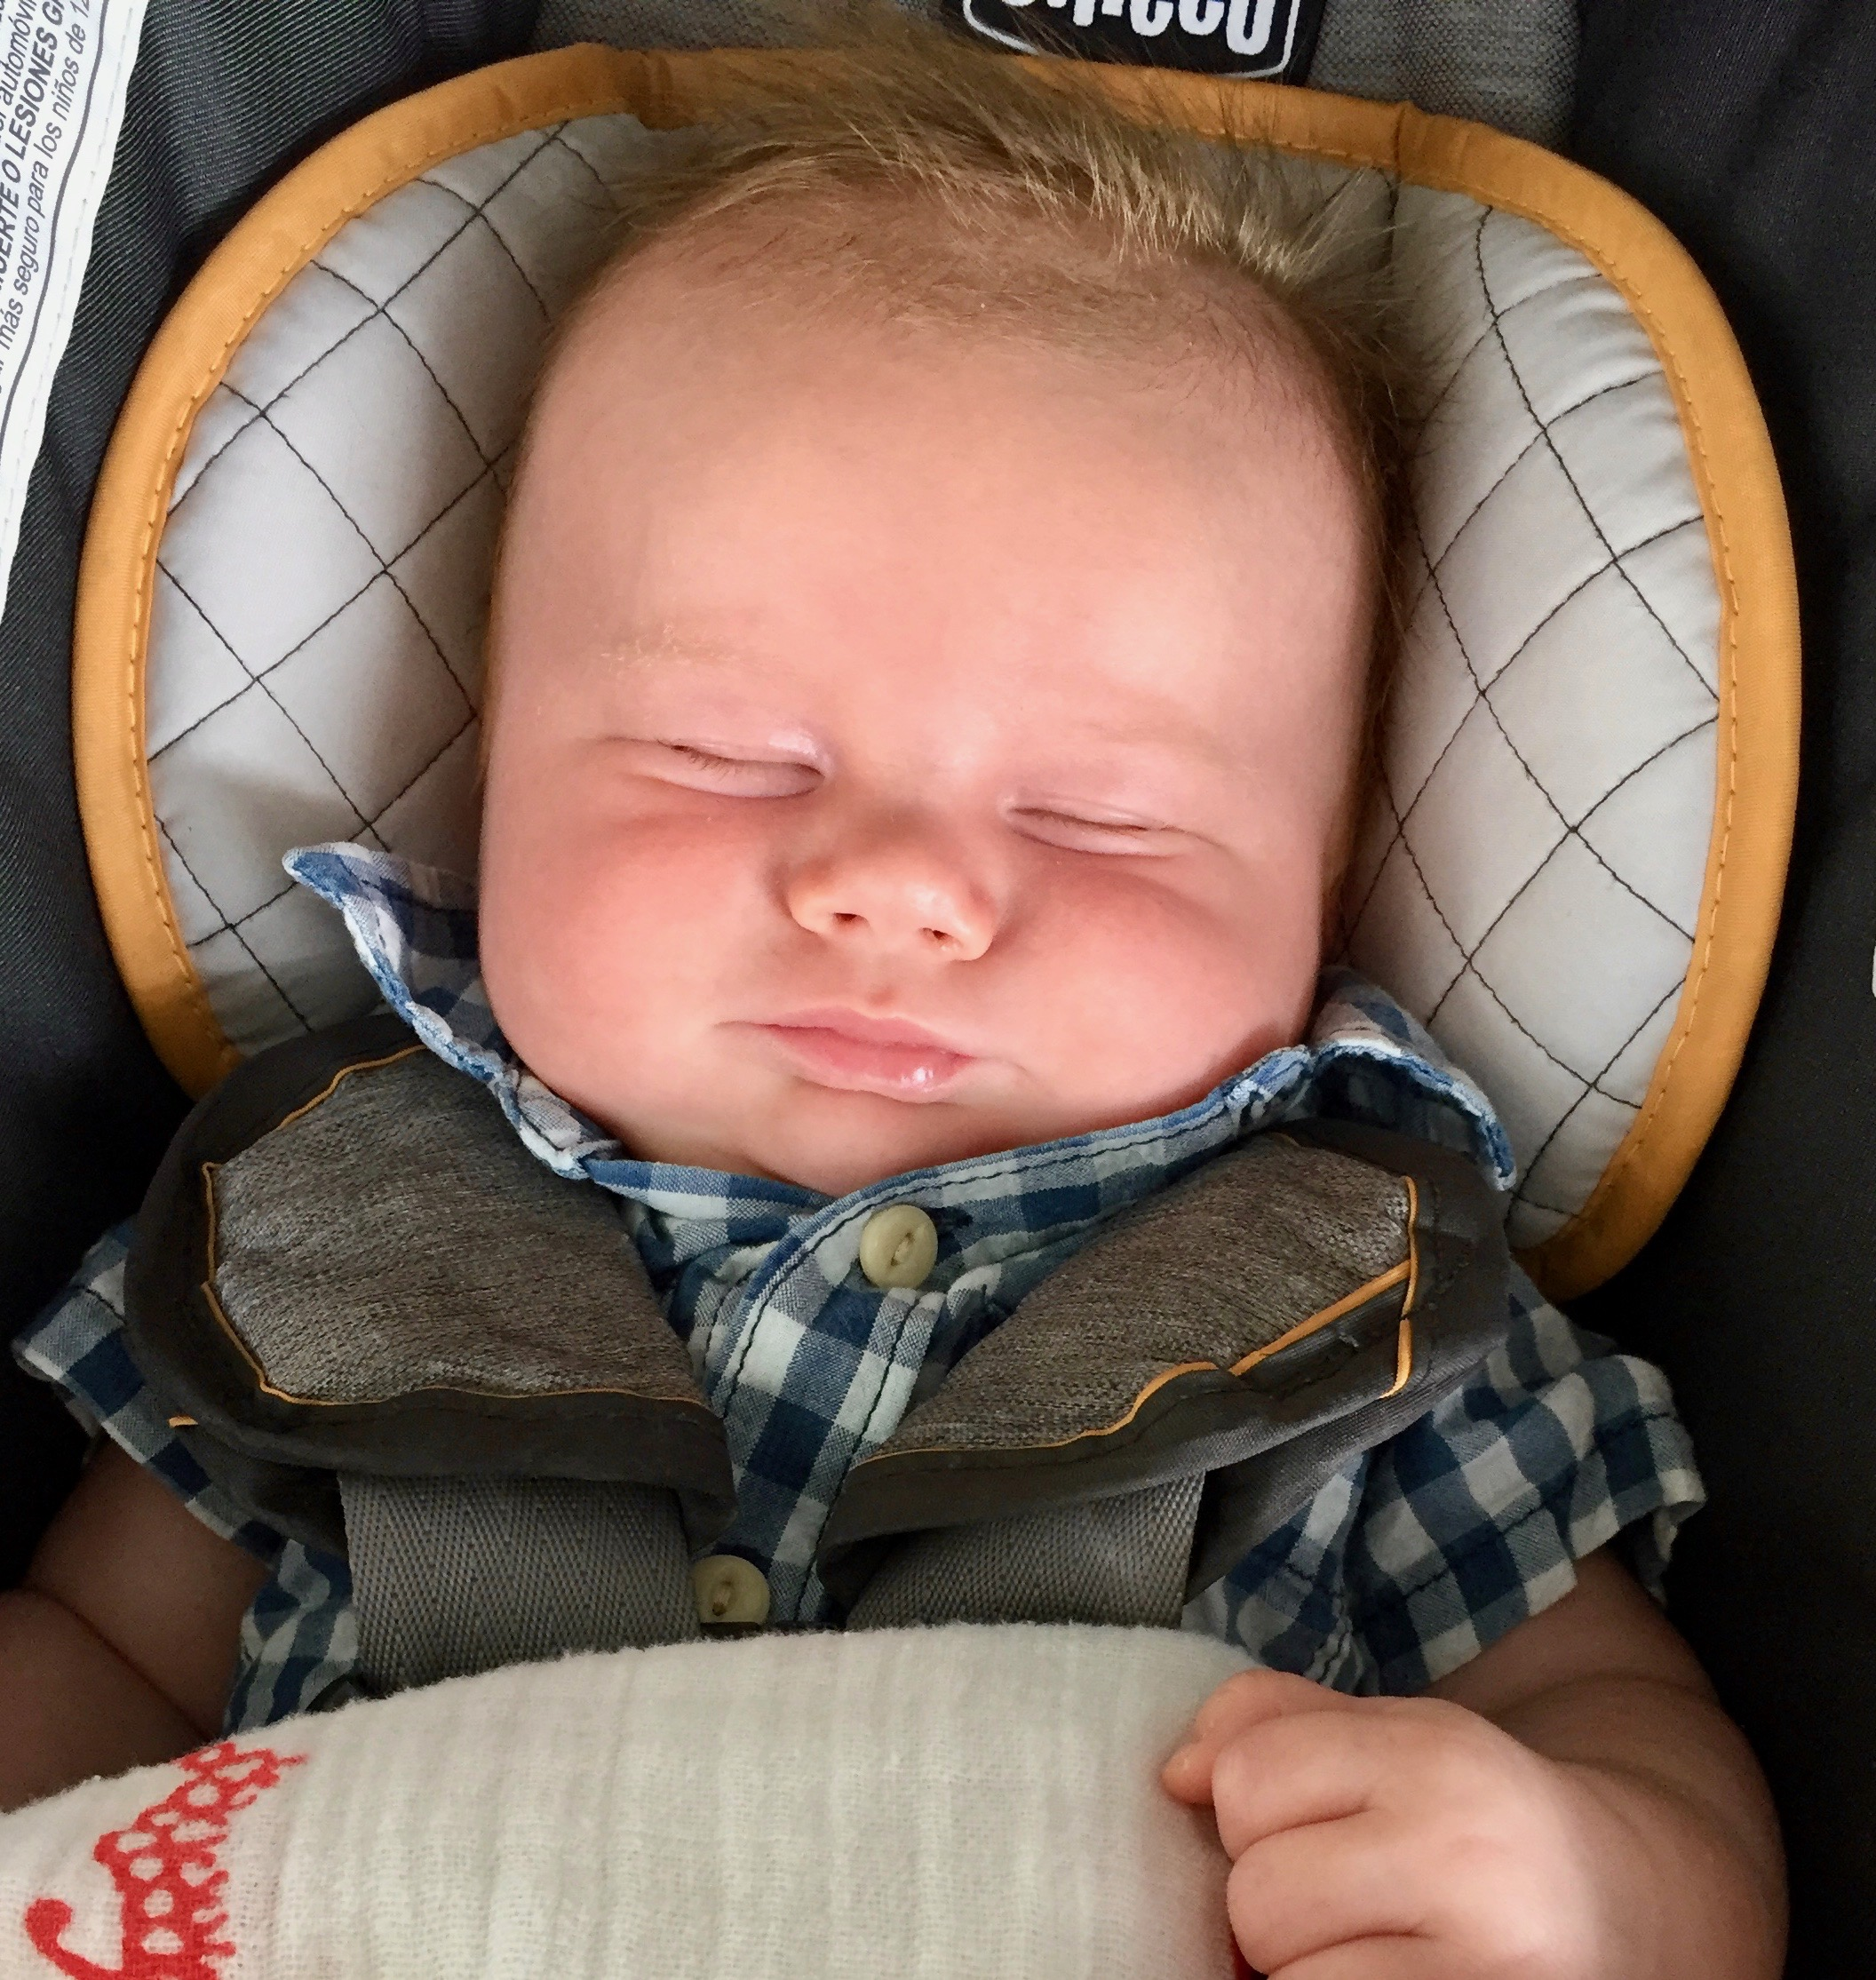 Thomas Christopher at 11 weeks old.